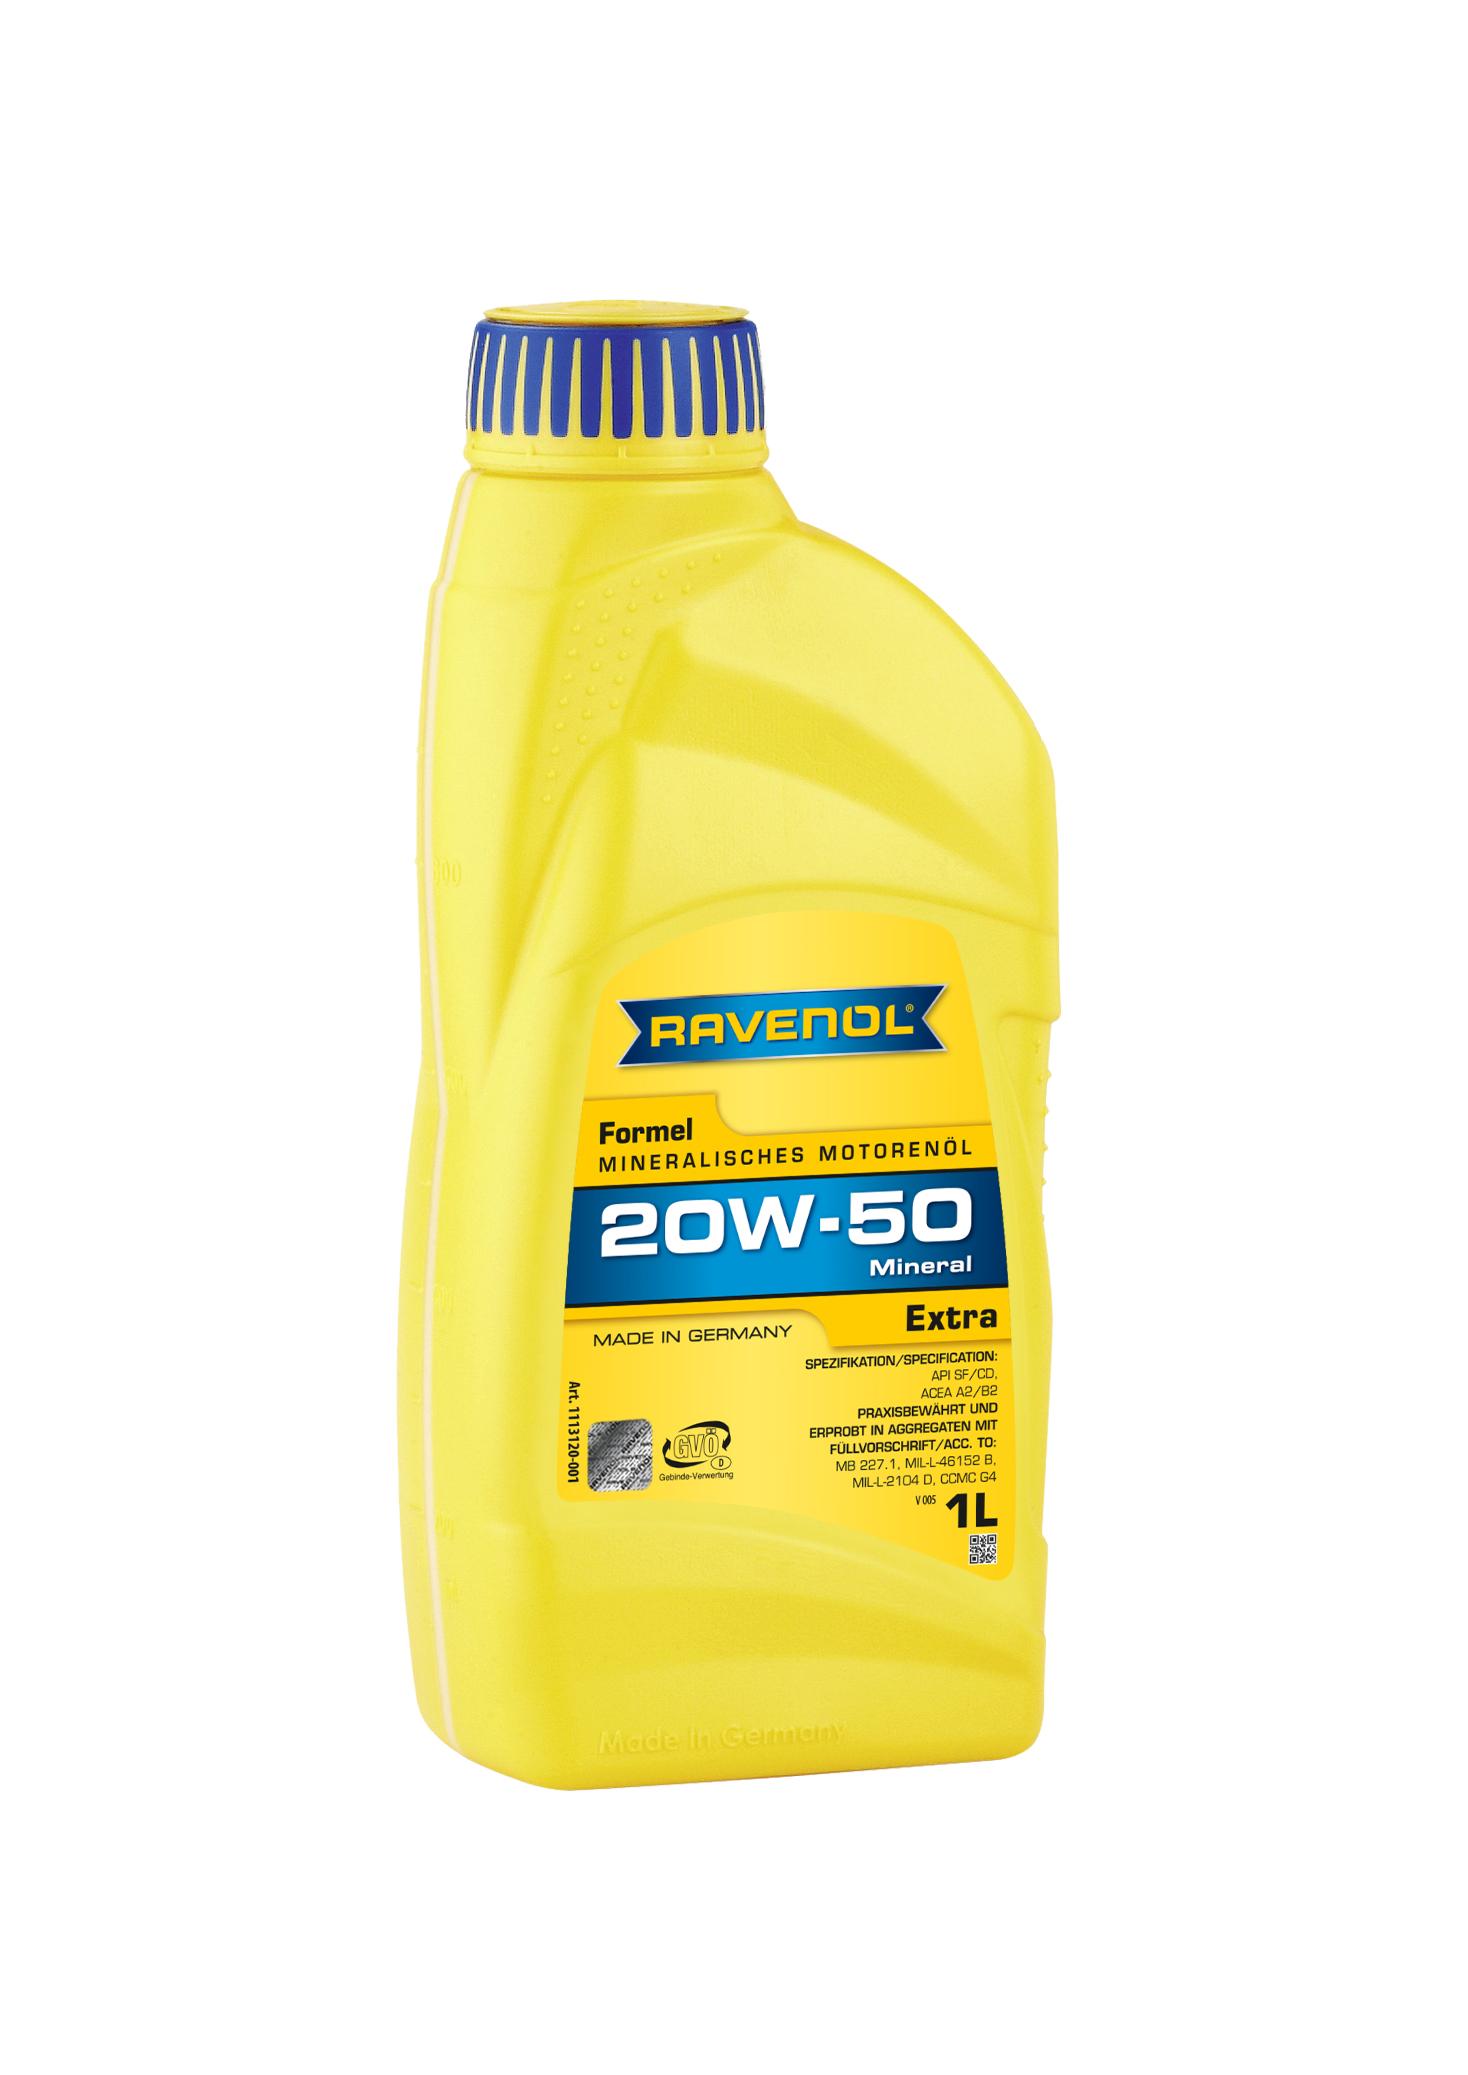 Ravenol Formel Extra Sae 20w 50 Ravenol